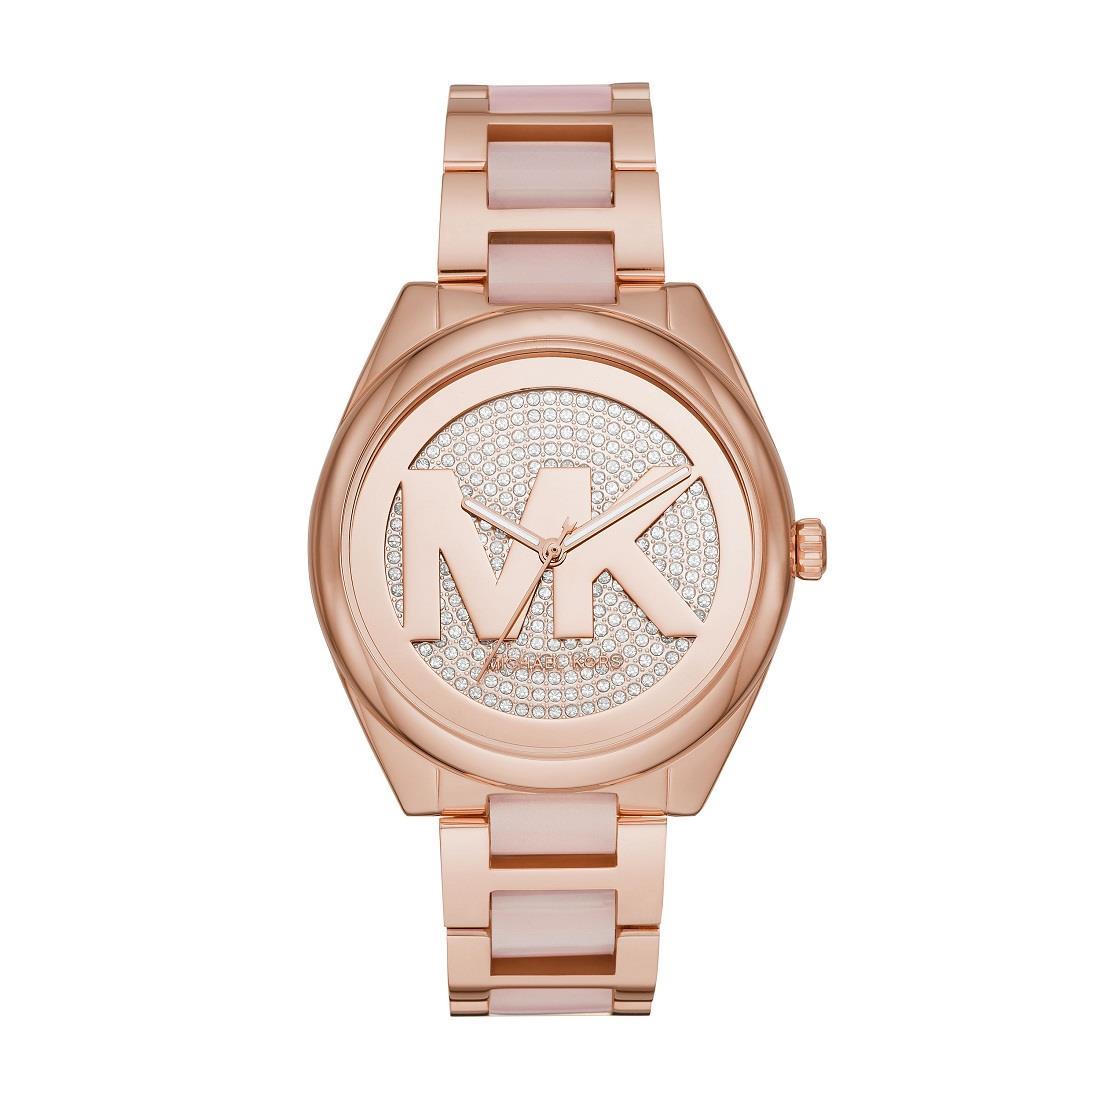 Reloj de mujer caso - MICHAEL KORS